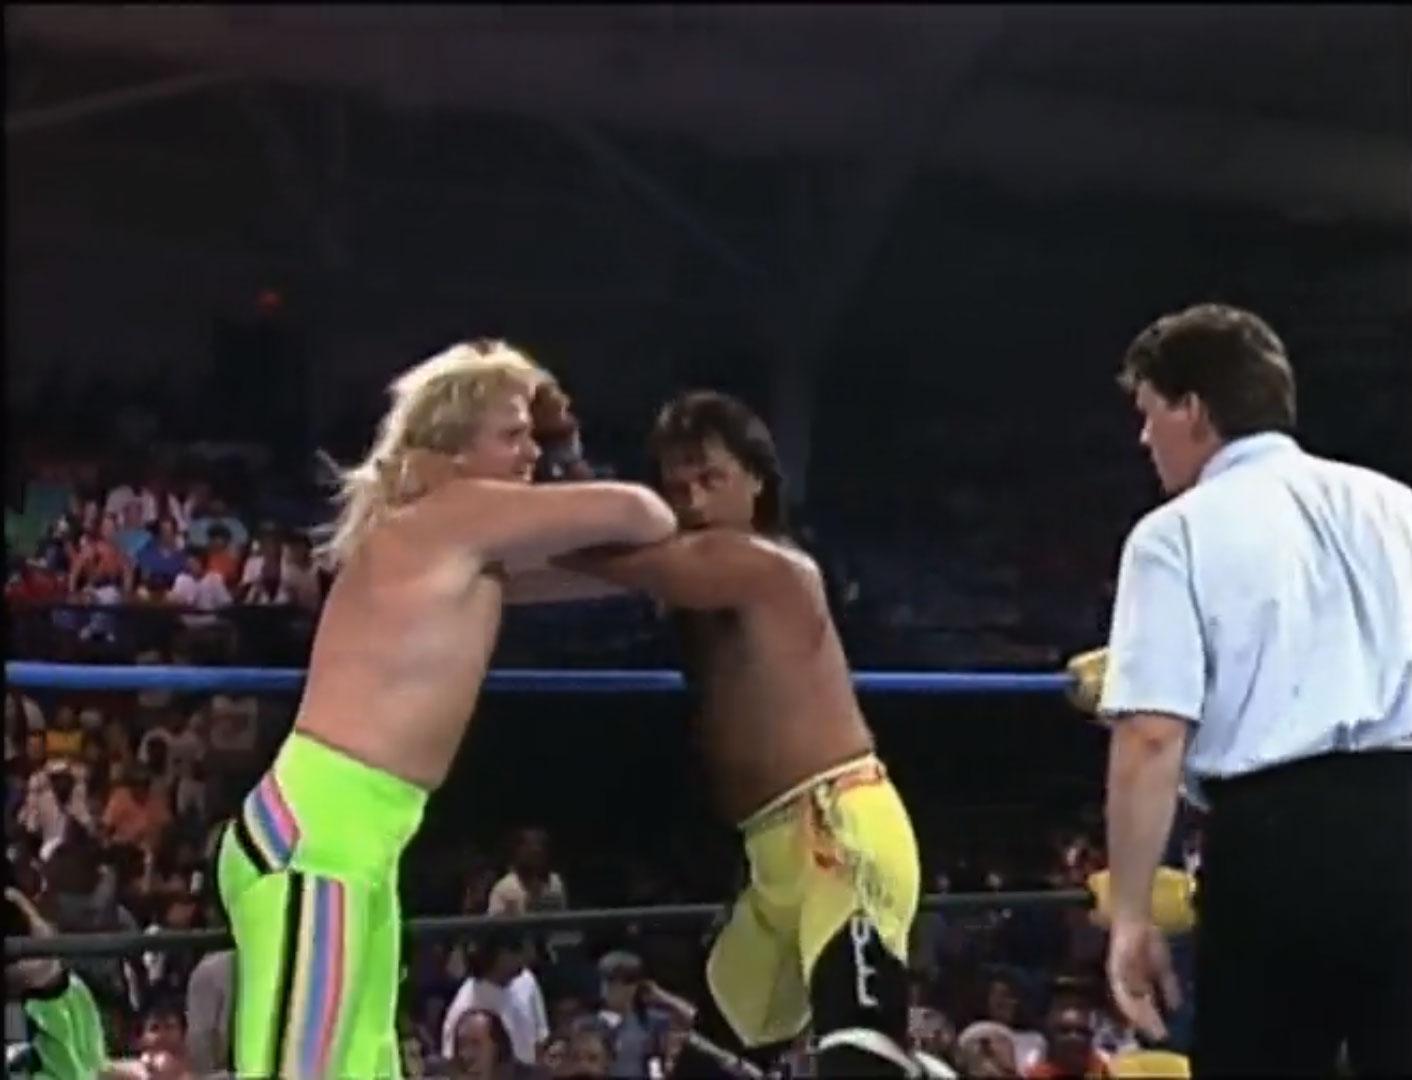 The Rock 'n' Roll Express vs. The Midnight Express United States Tag Team Championship NWA Clash Of The Champions XI: Coastal Crush Jun 13th 1990